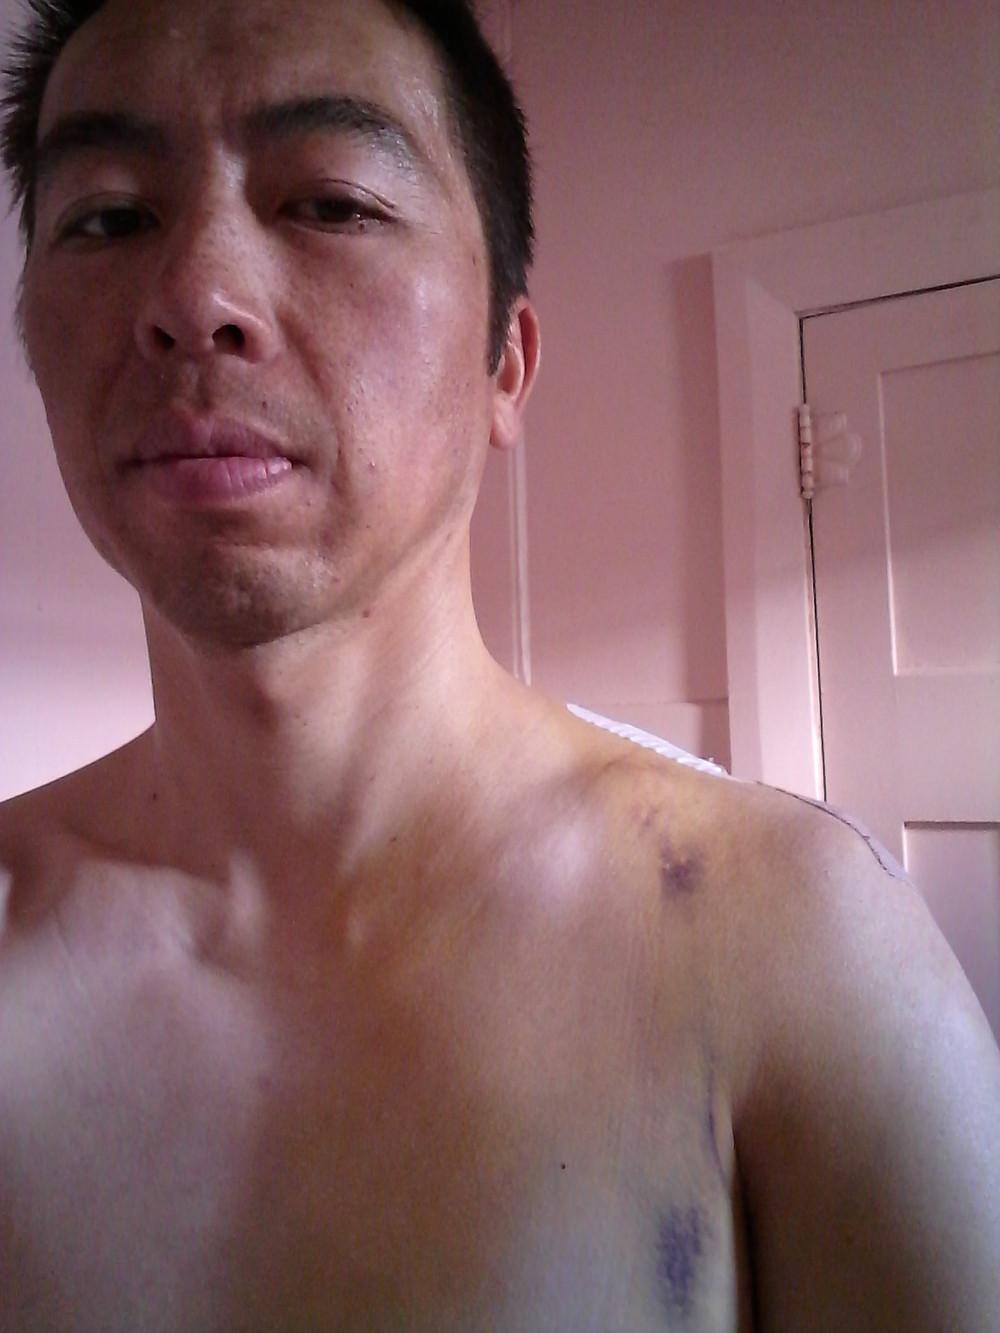 Nice bruising but healing well!